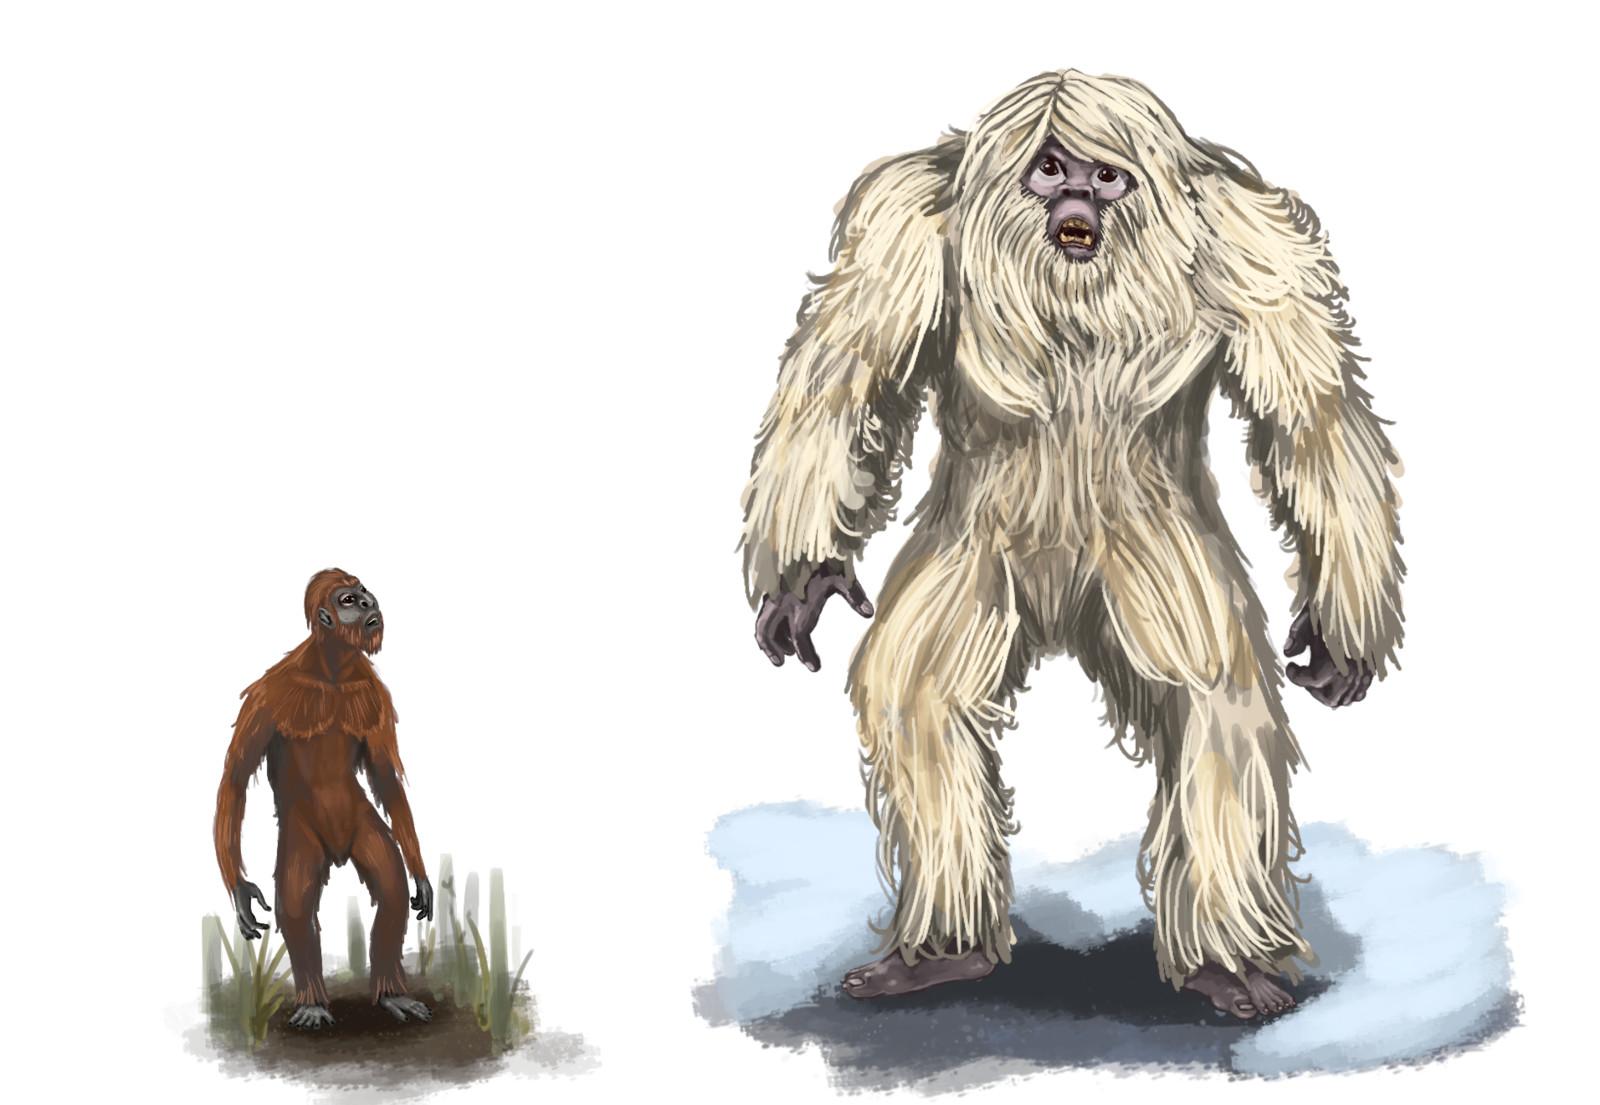 Orang Pendek and the Yeti